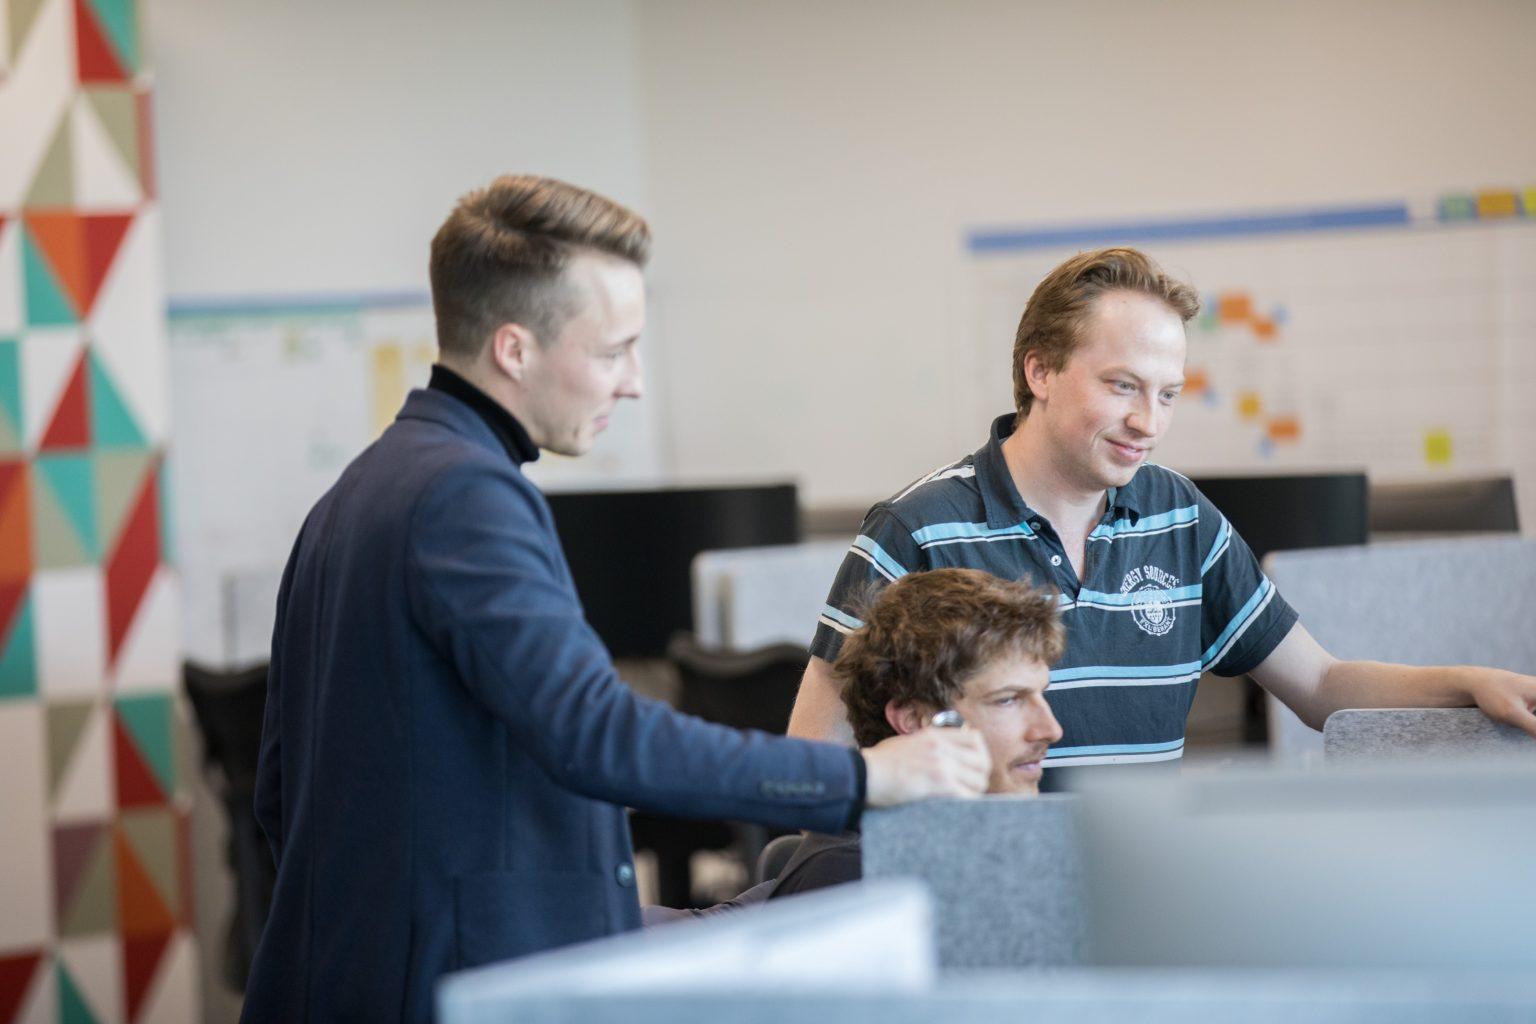 Three men crowded around a computer